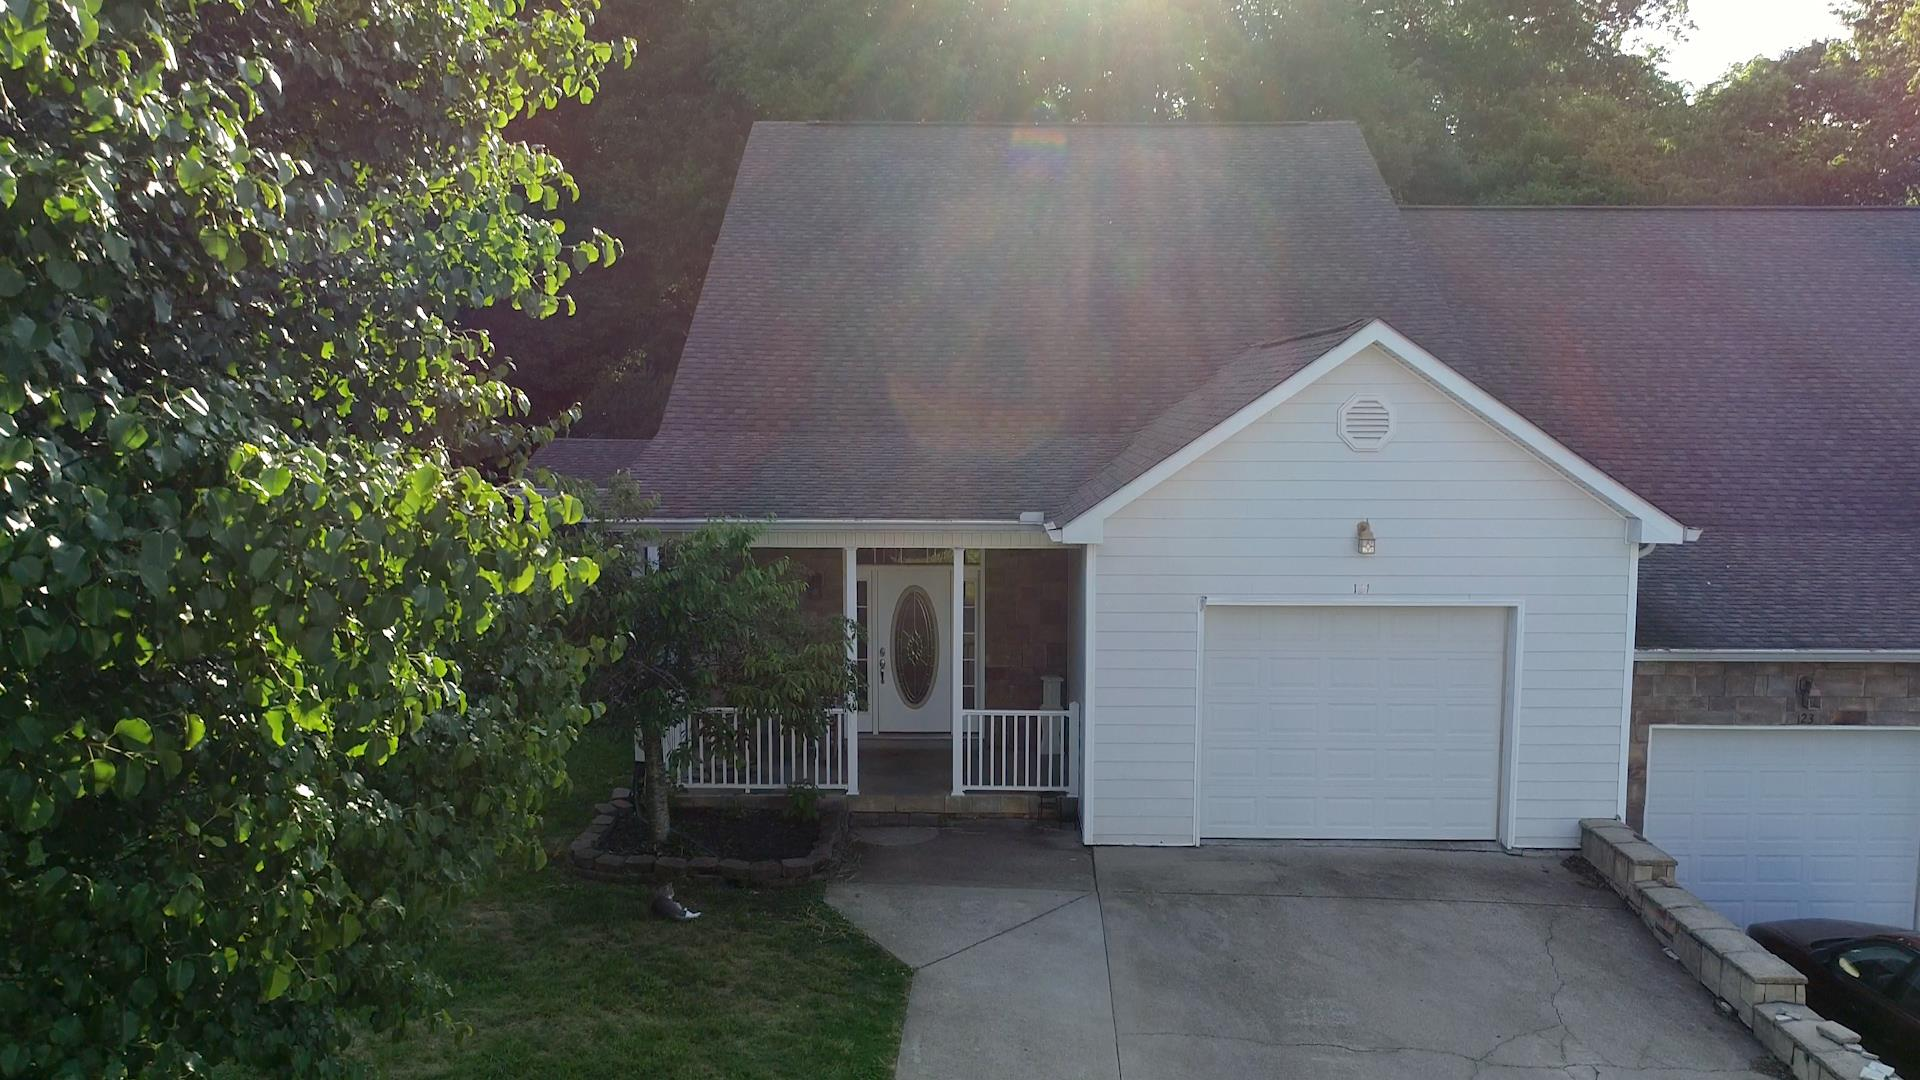 121 Rose Dr, Dover, TN 37058 - Dover, TN real estate listing